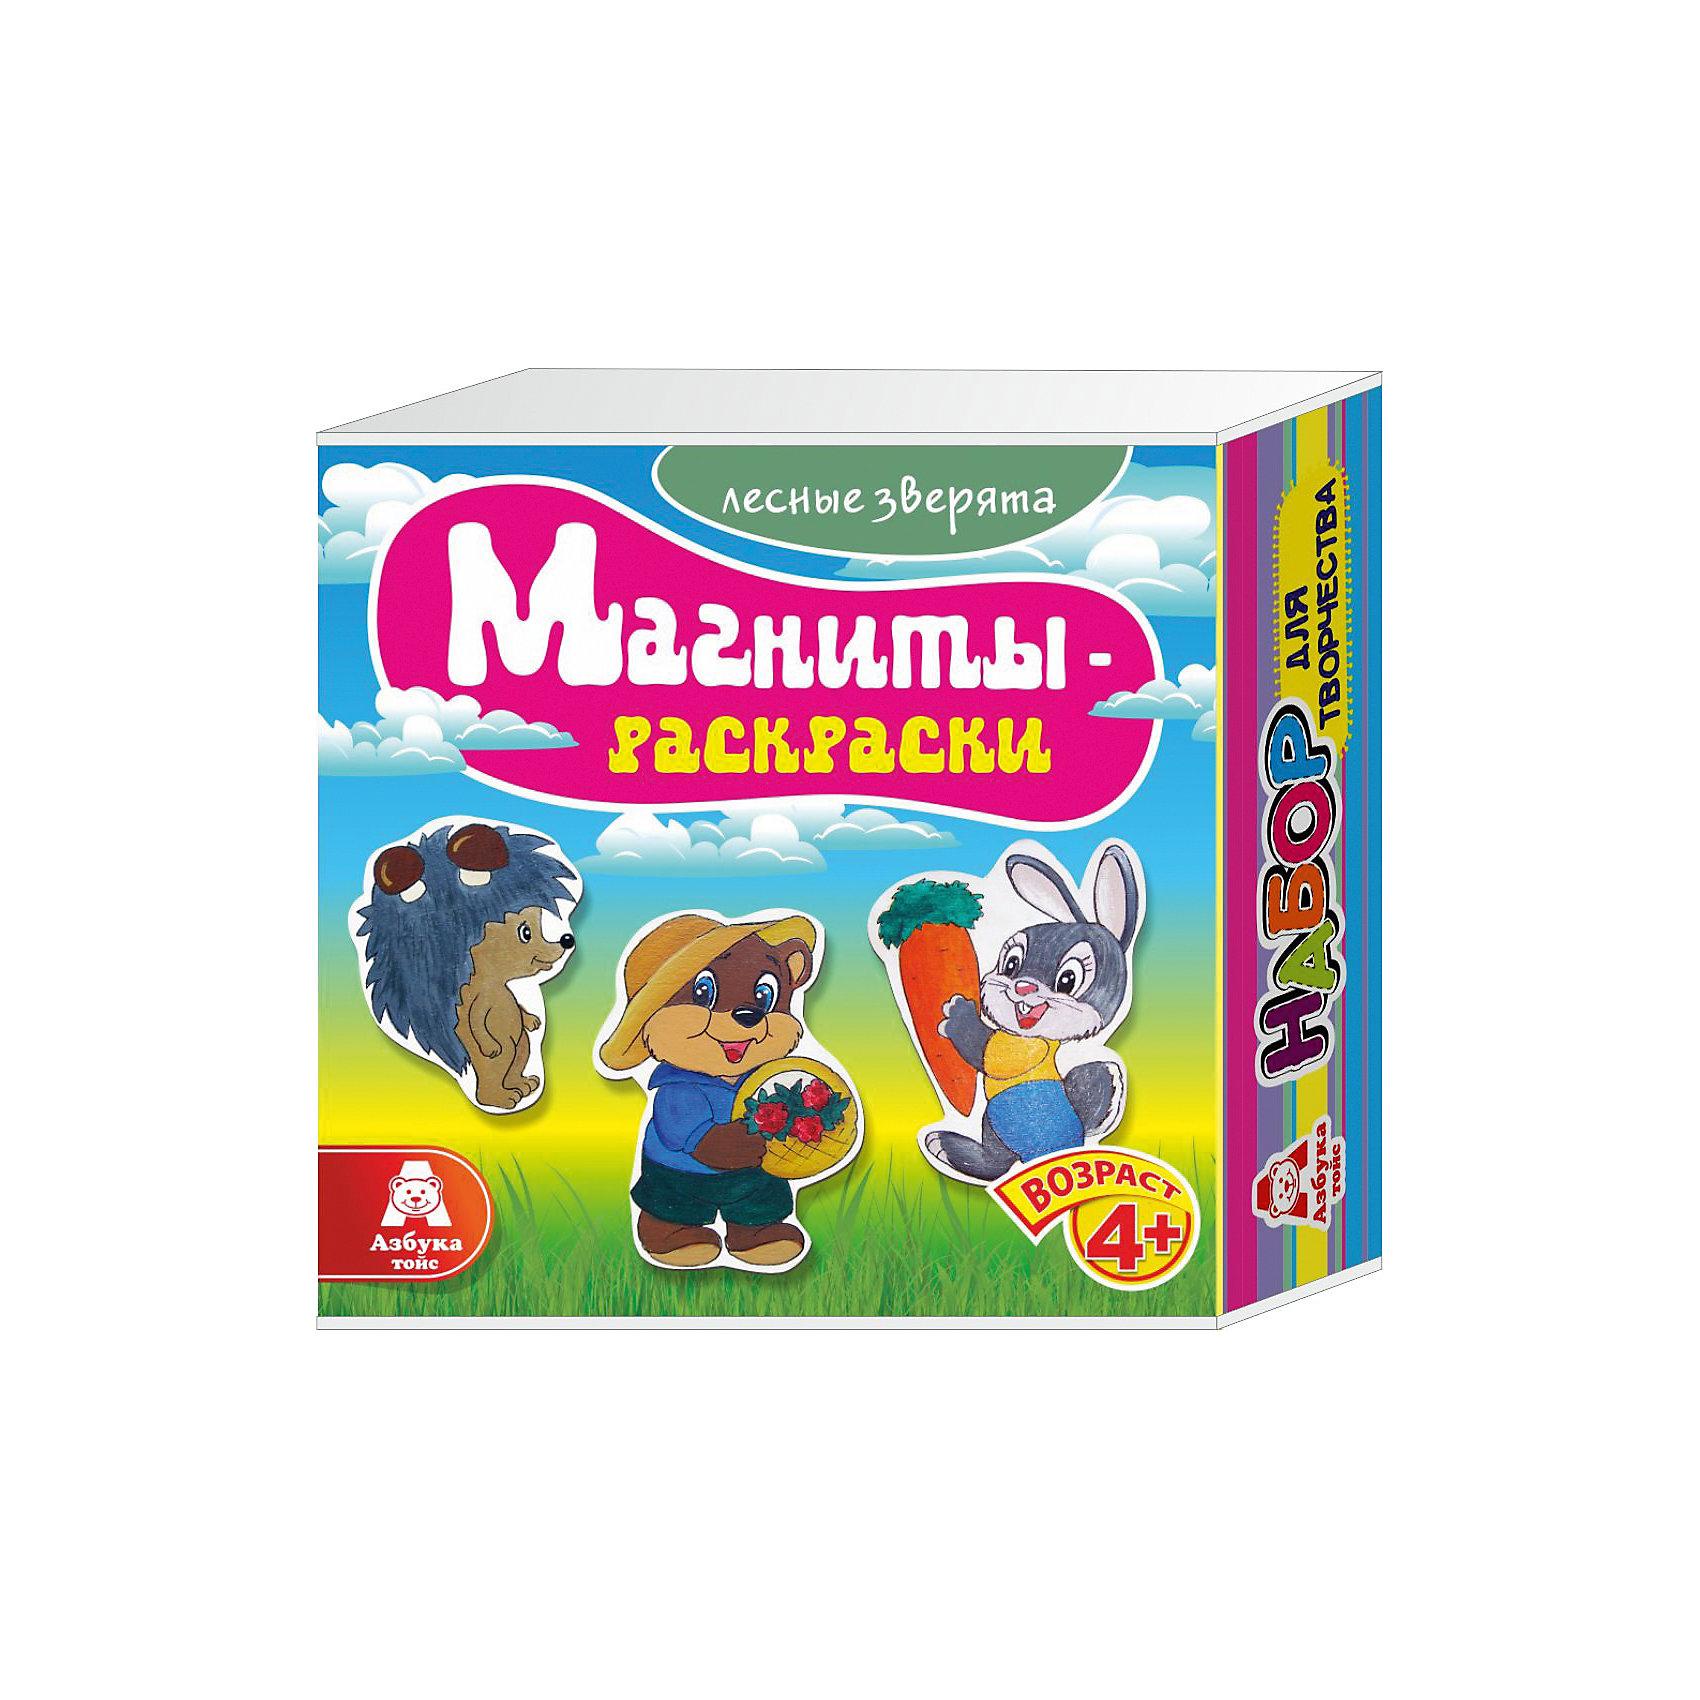 Азбука Тойс Магниты-раскраски Лесные зверята азбука тойс магниты раскраски лесные зверята